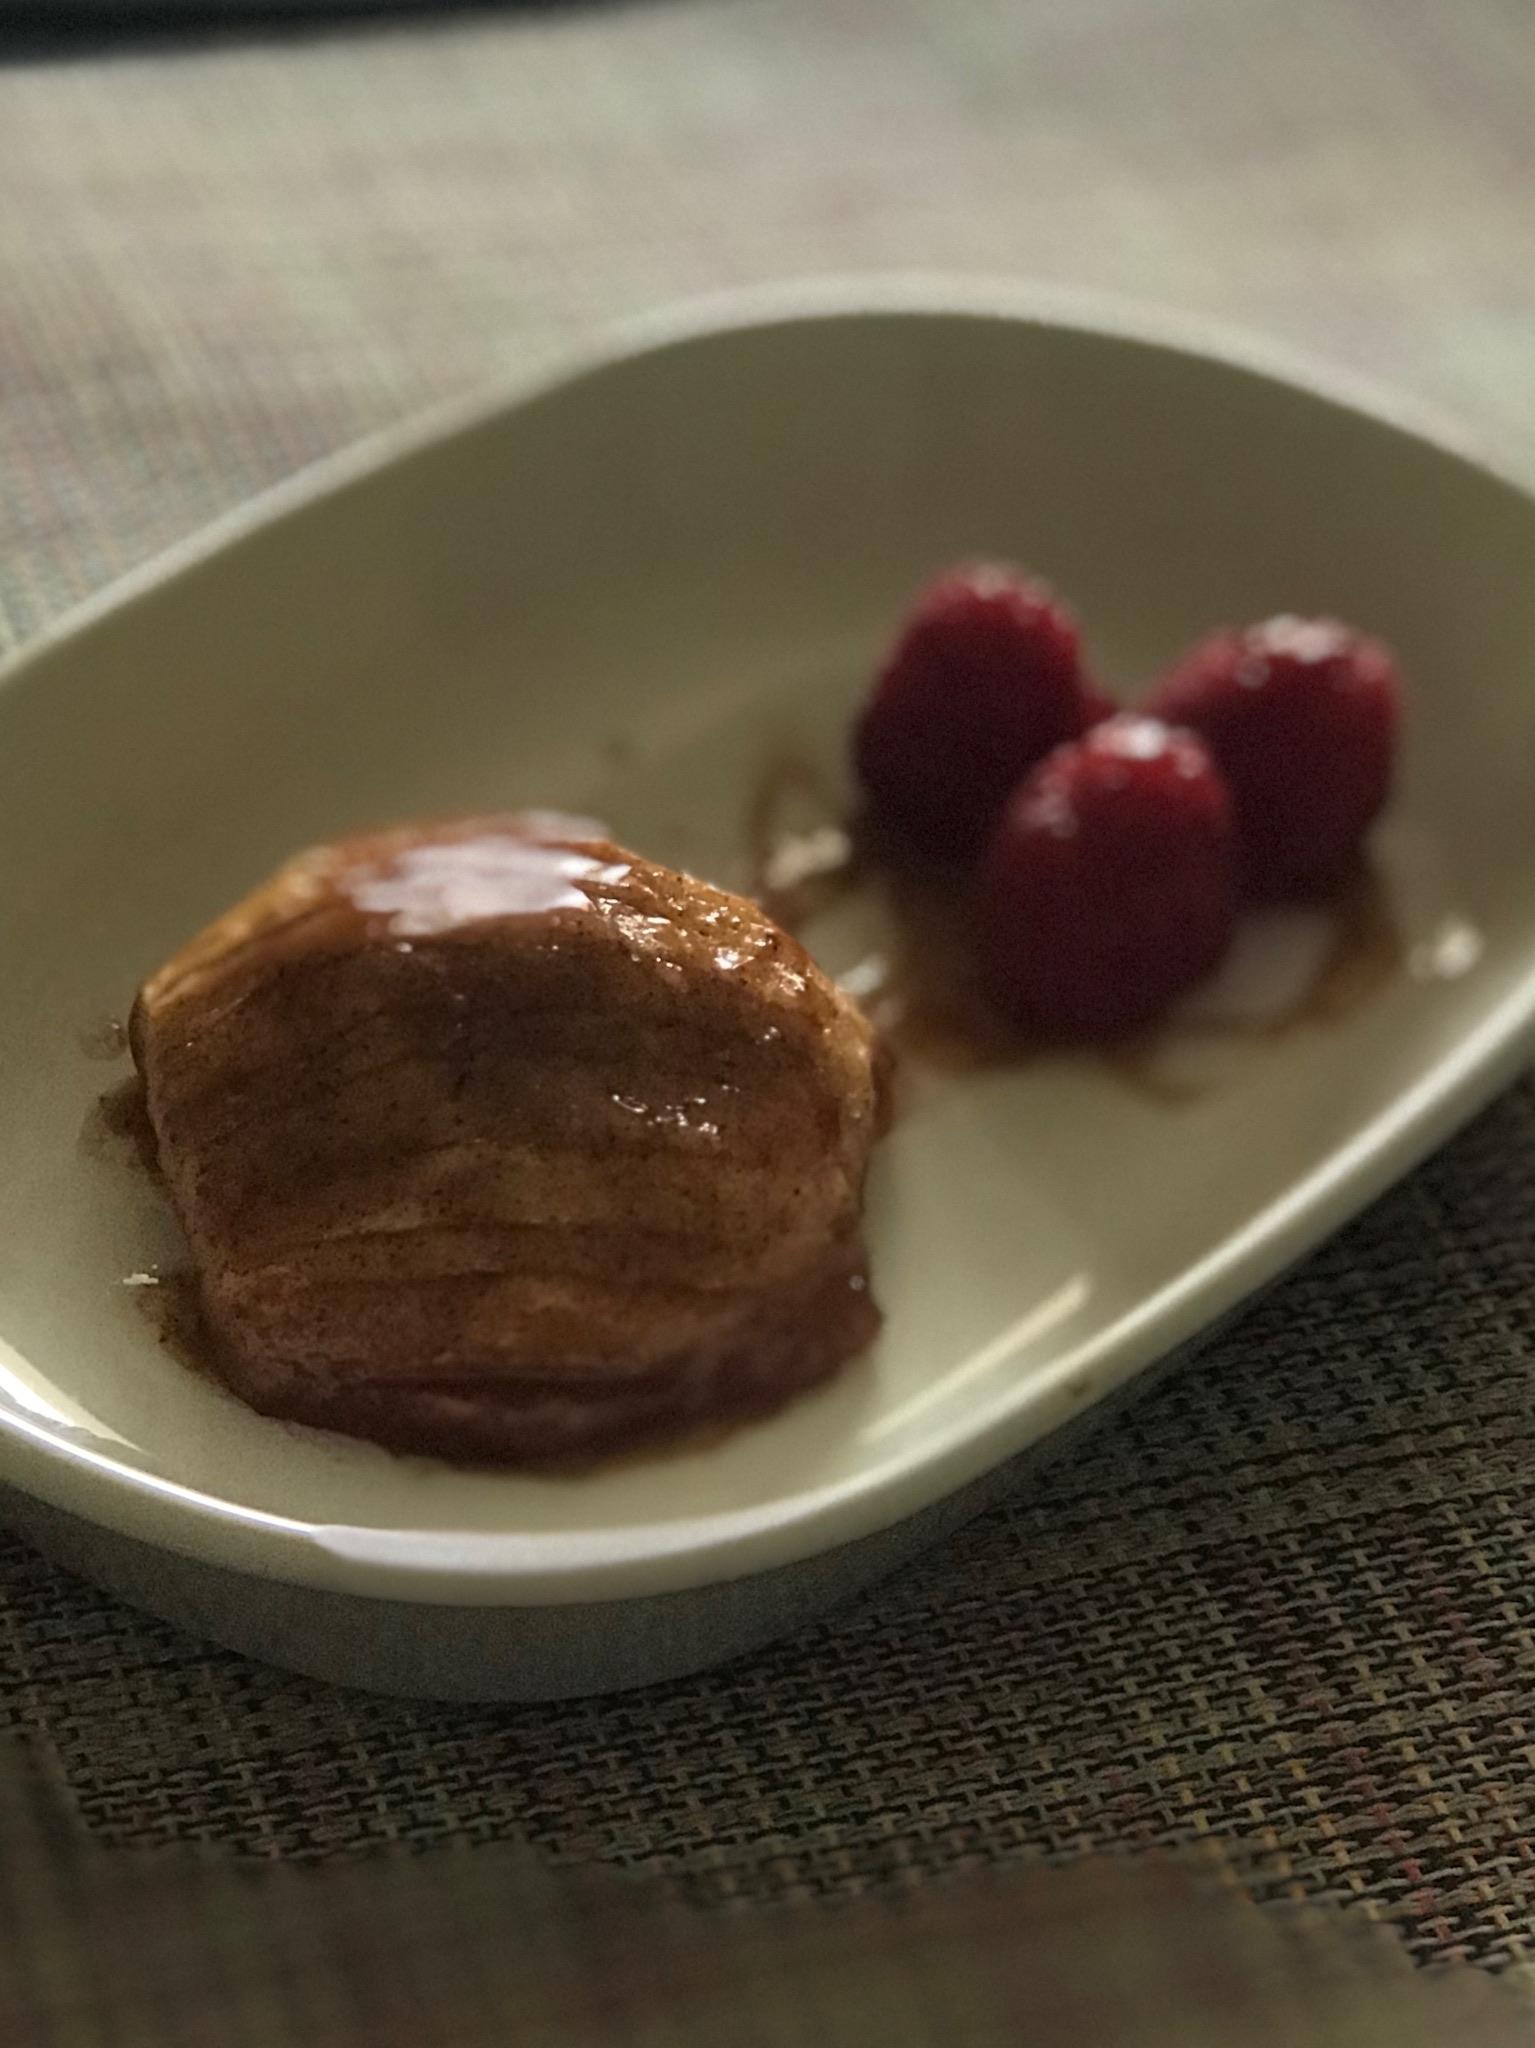 Hasselback Cinnamon-Caramel Baked Apples